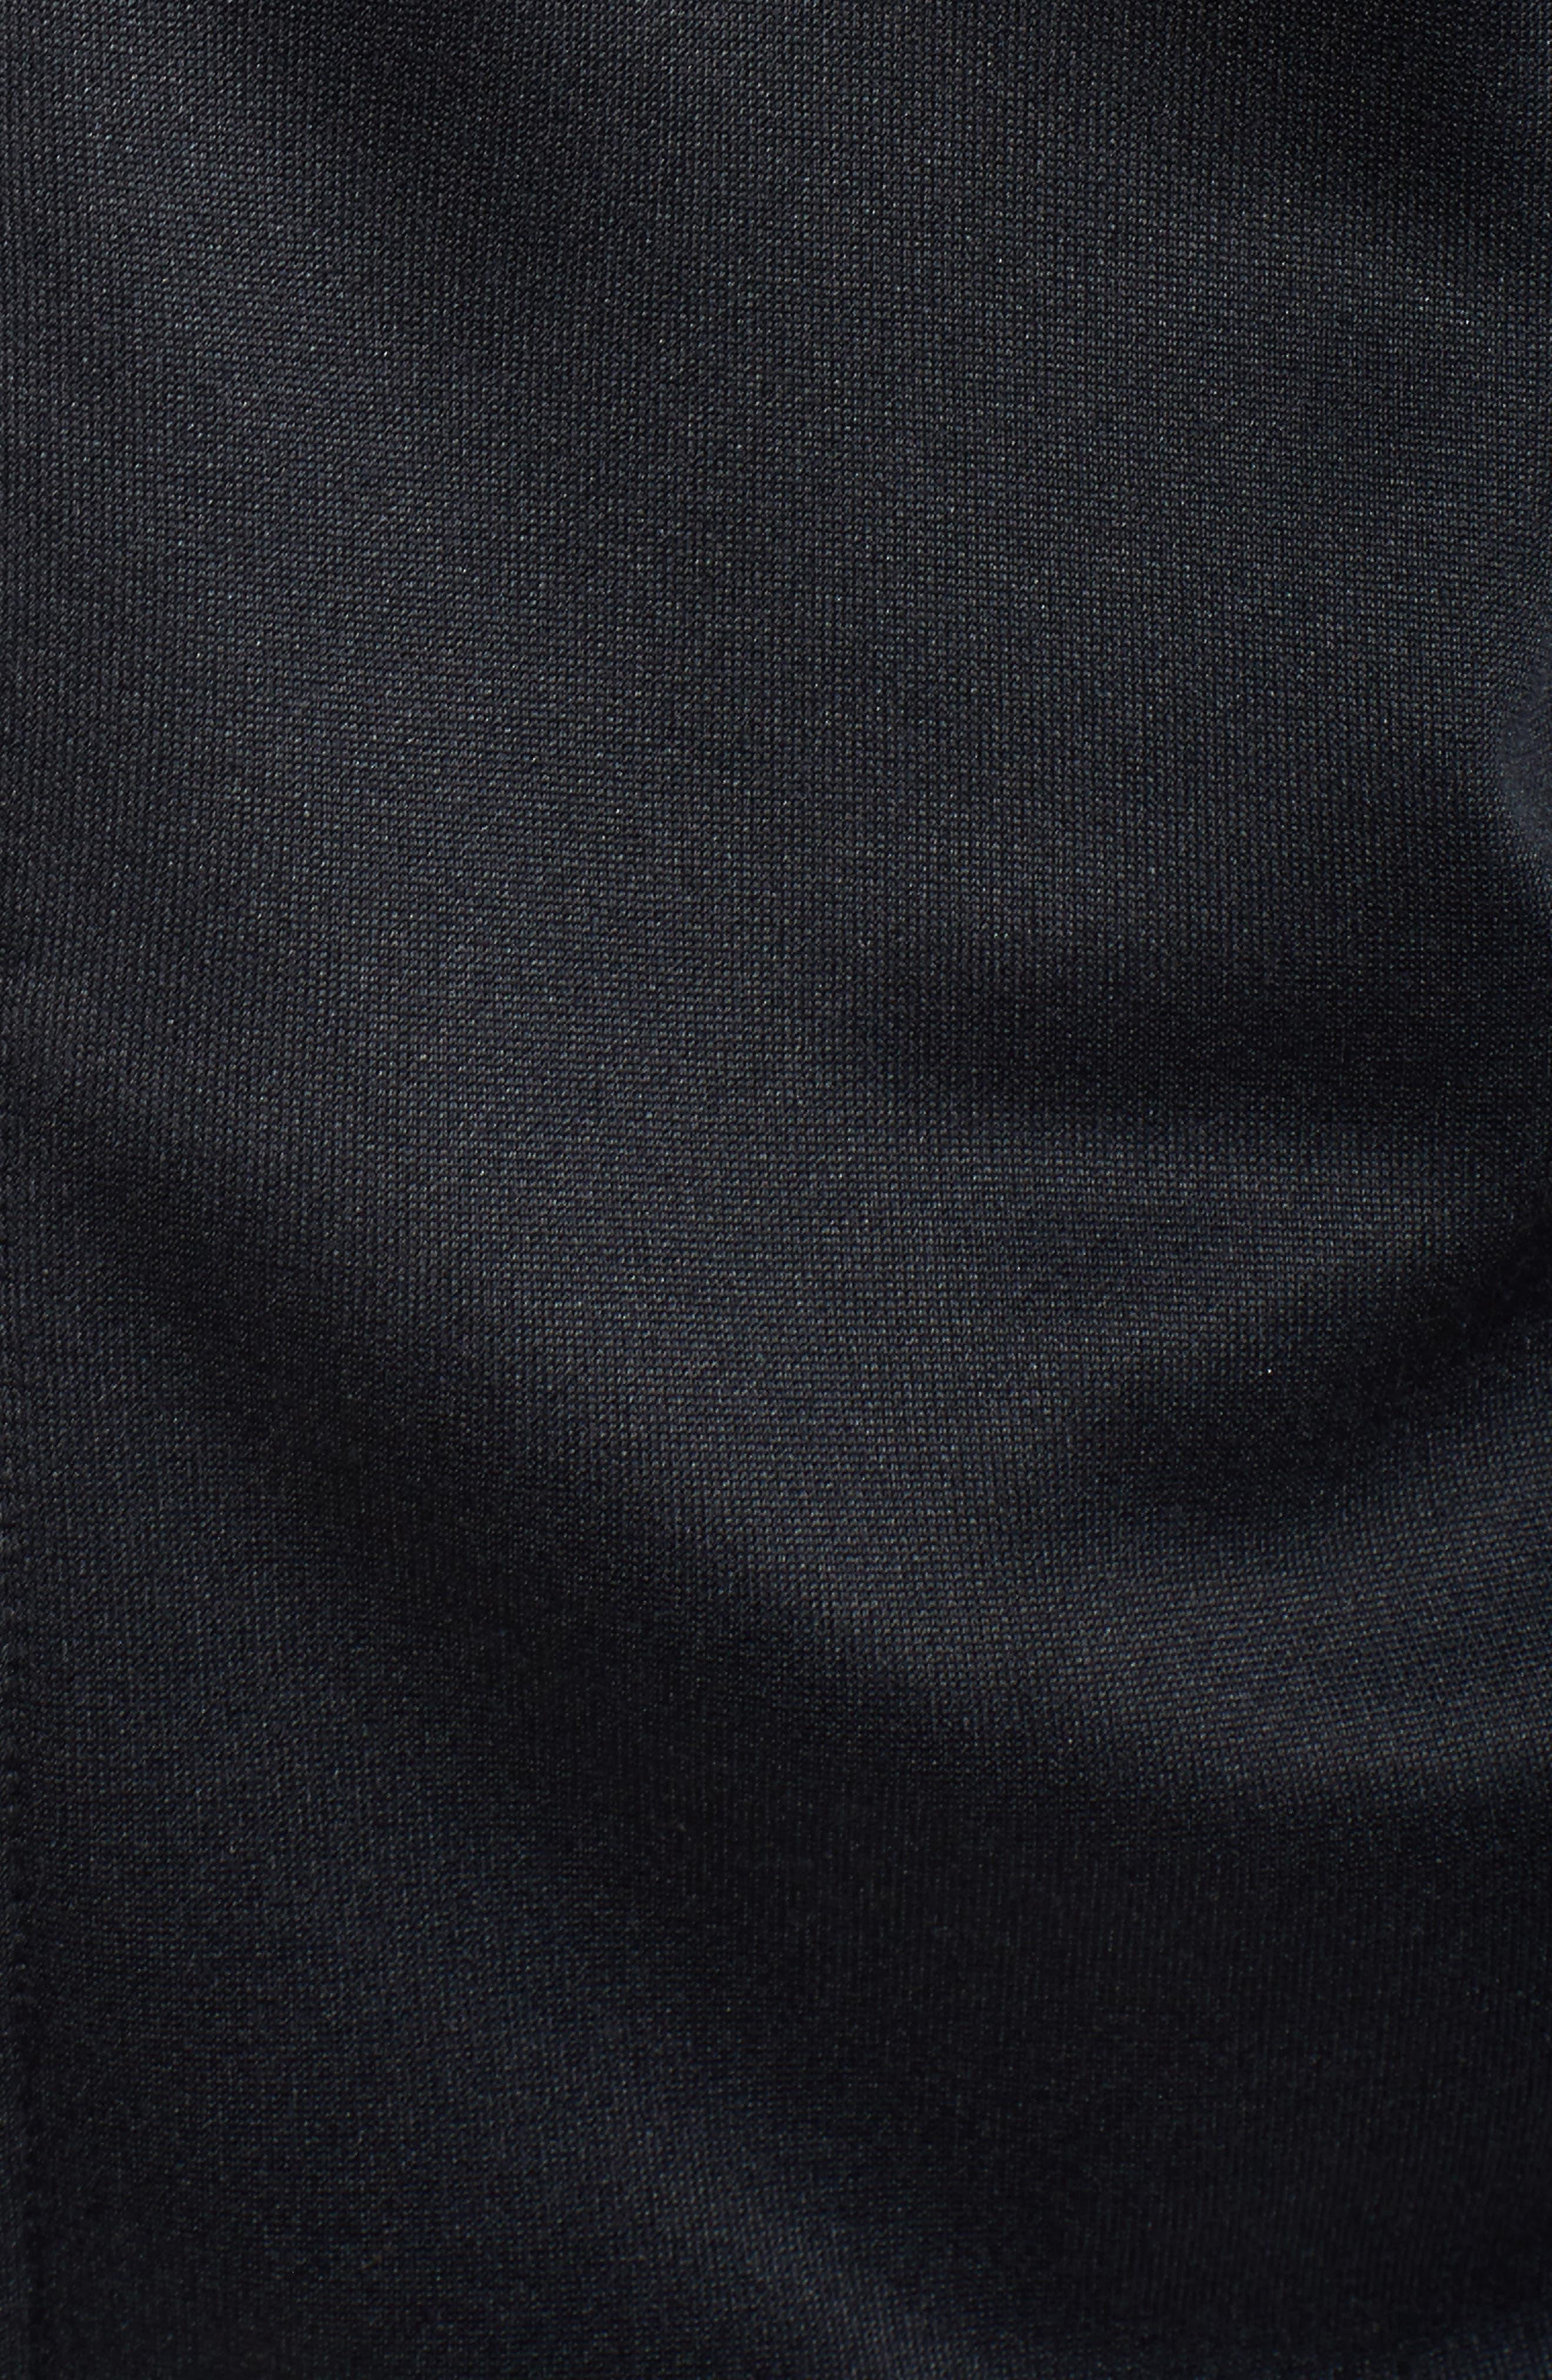 Sportswear Women's Zip Hoodie,                             Alternate thumbnail 6, color,                             010